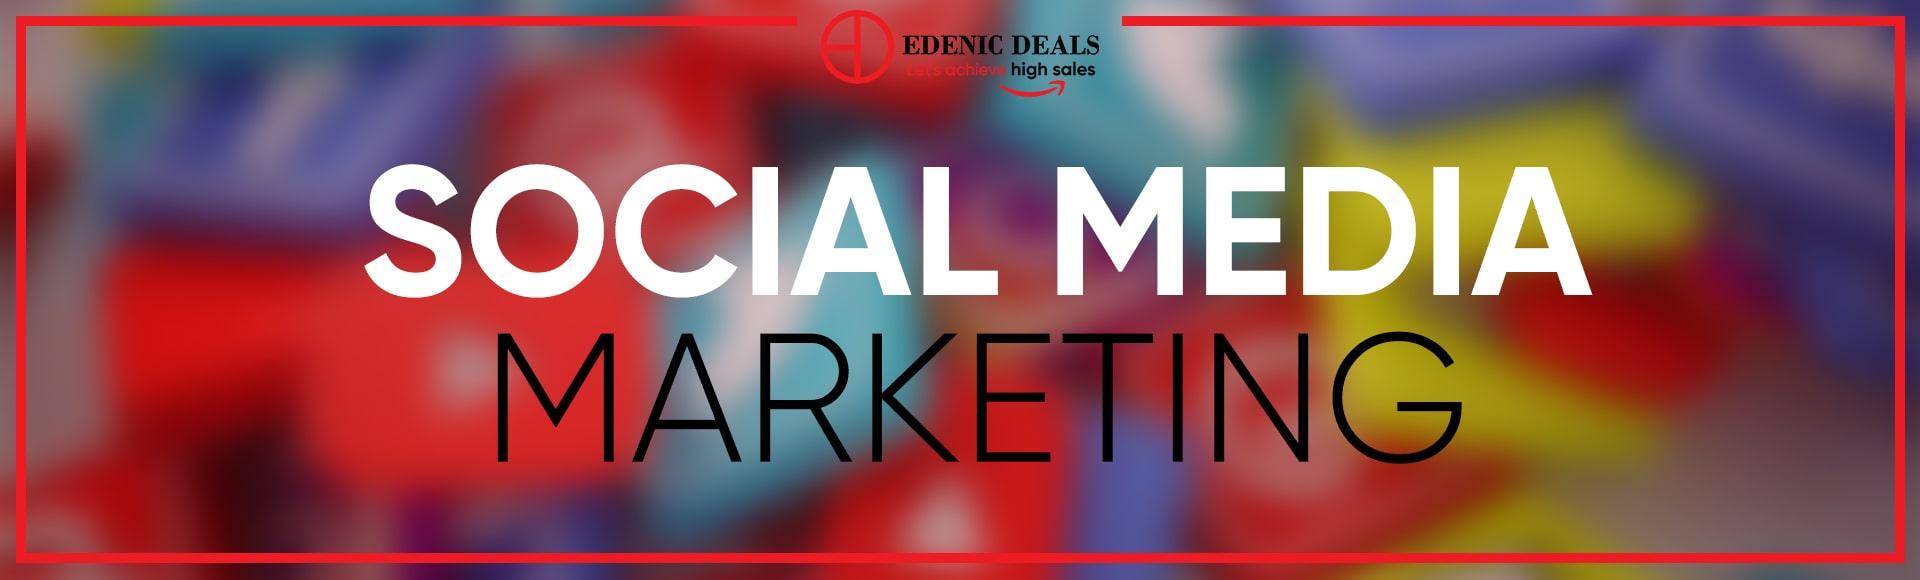 Edenic Deals Social Media Marketing